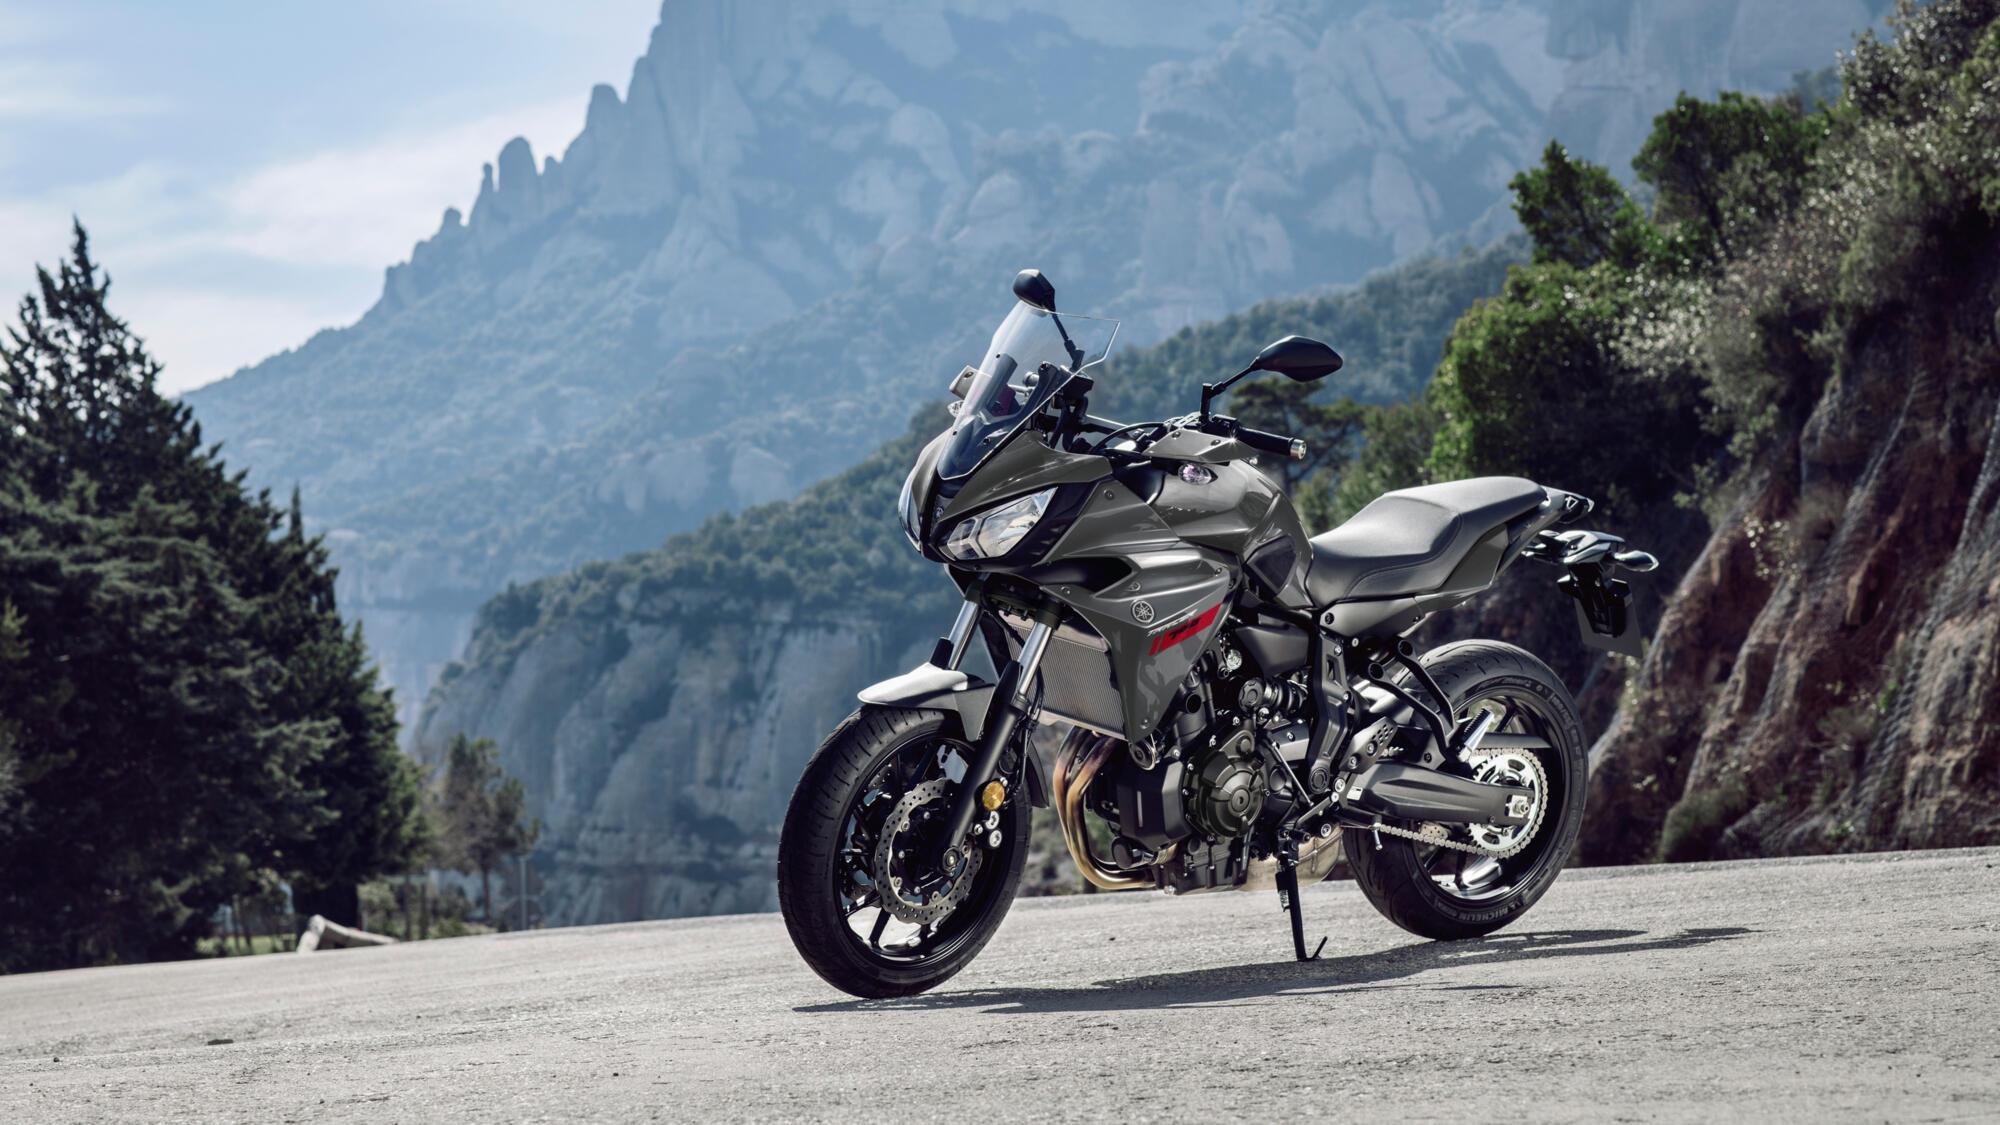 https://cdn2.yamaha-motor.eu/prod/product-assets/2019/MT07TR/2019-Yamaha-MT07TR-EU-Nimbus_Grey-Static-001-03.jpg